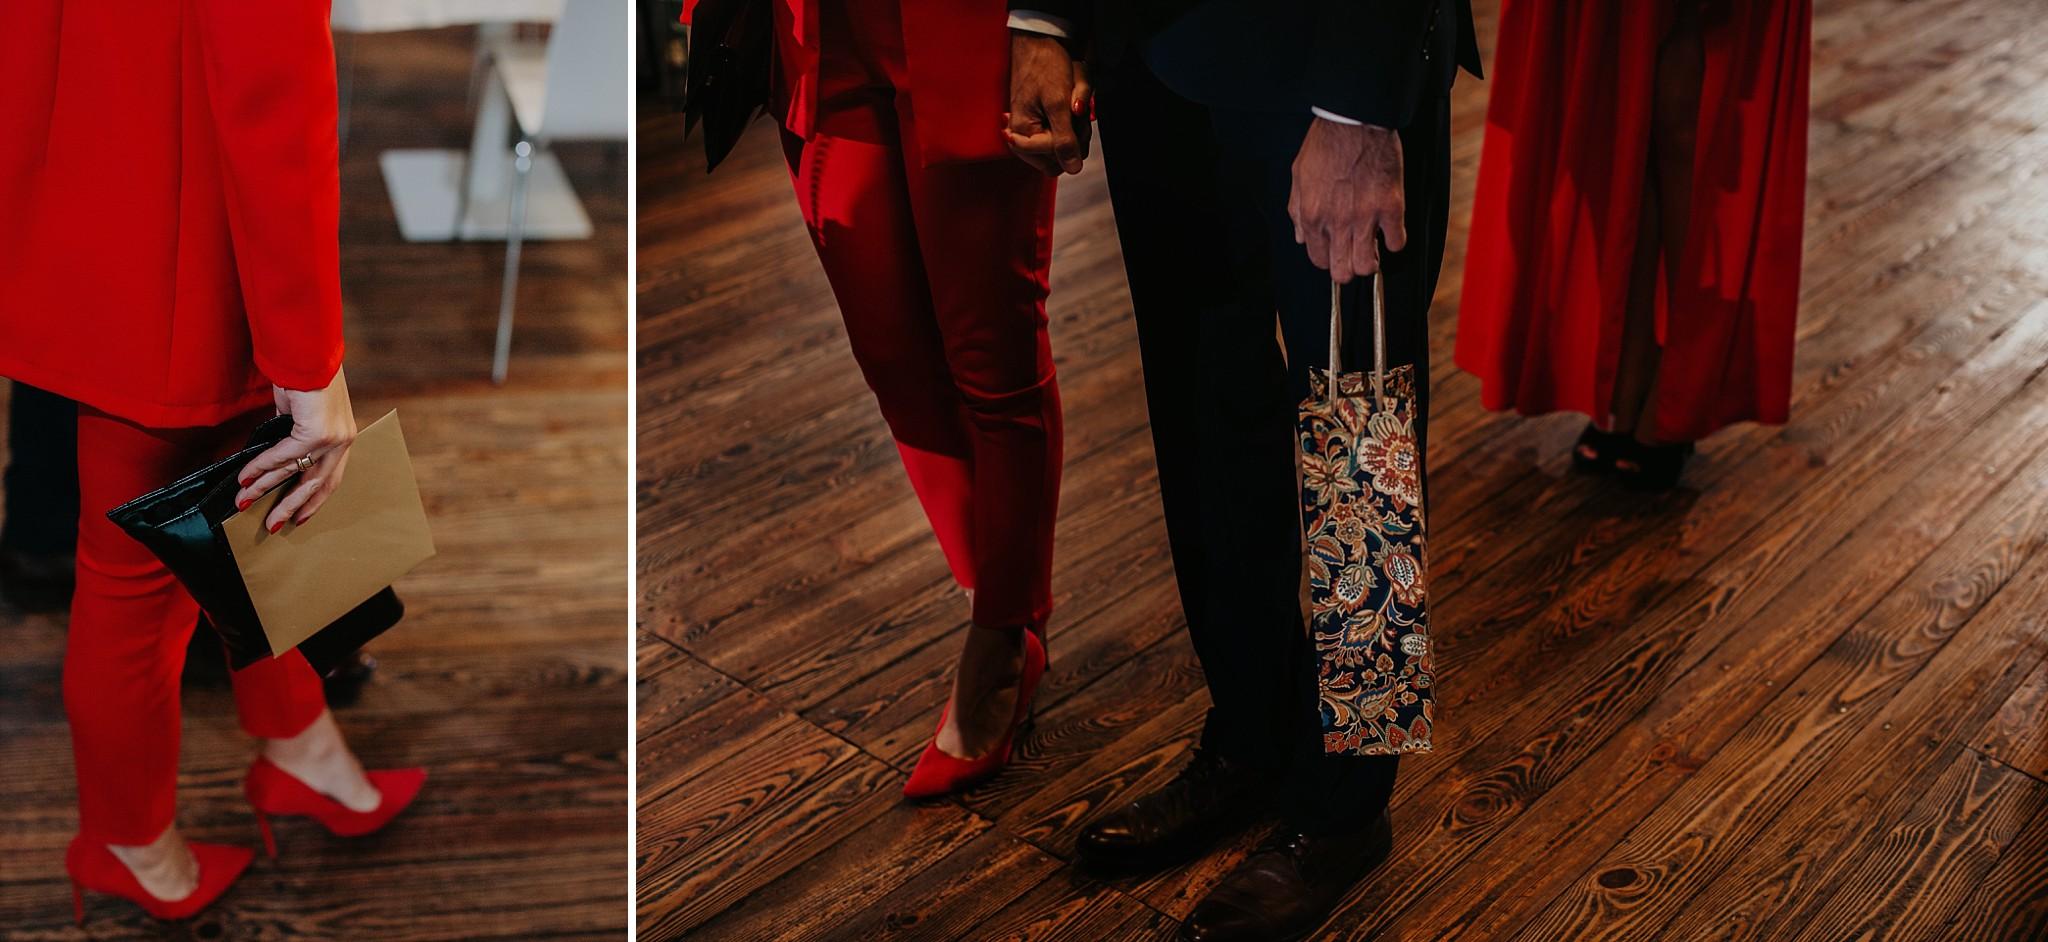 fotograf poznan wesele dobra truskawka piekne wesele pod poznaniem wesele w dobrej truskawce piekna para mloda slub marzen slub koronawirus slub listopad wesele koronawirus 274